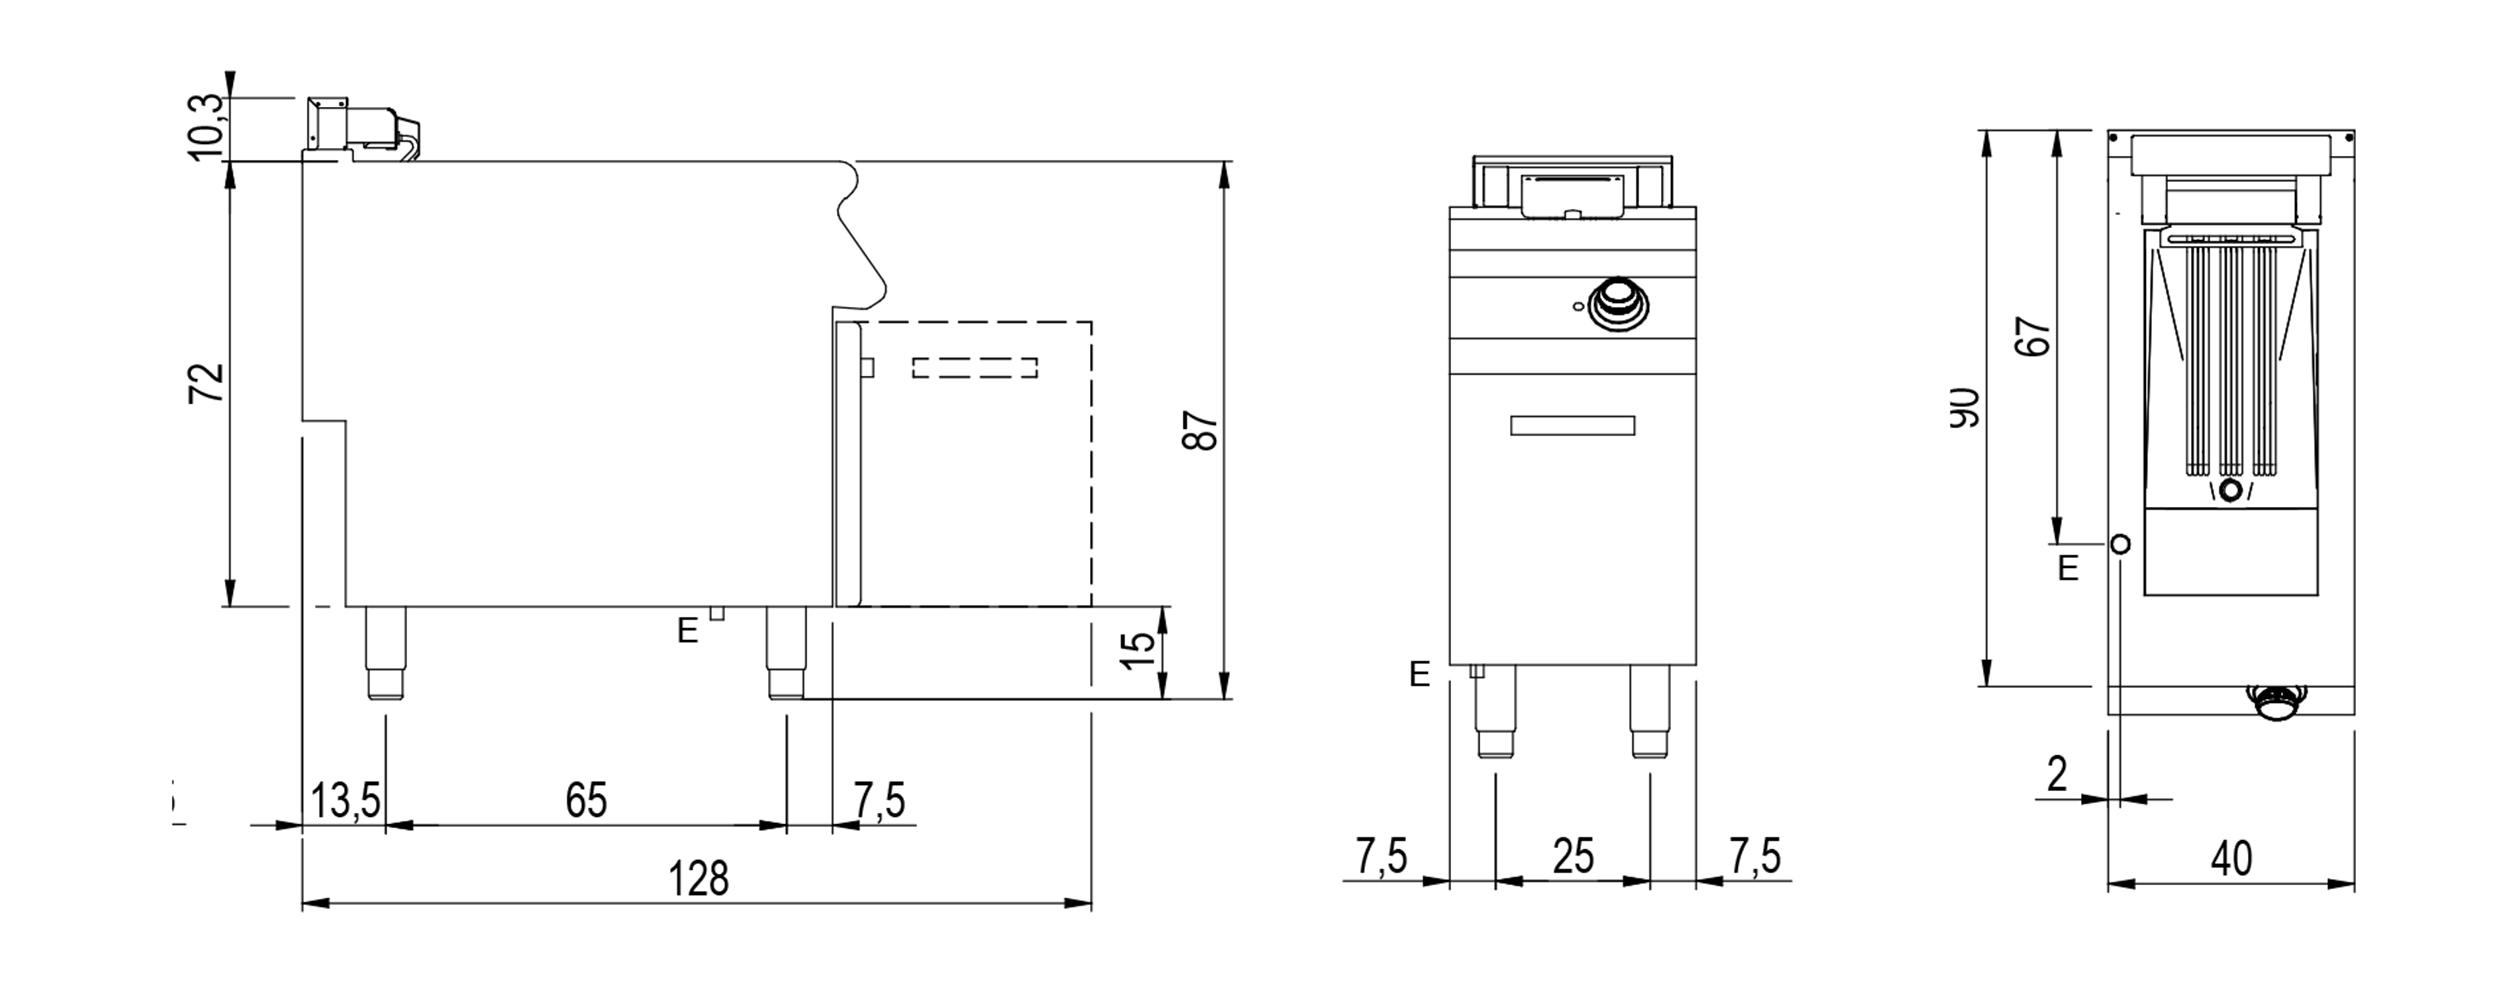 Technical datasheet drawing